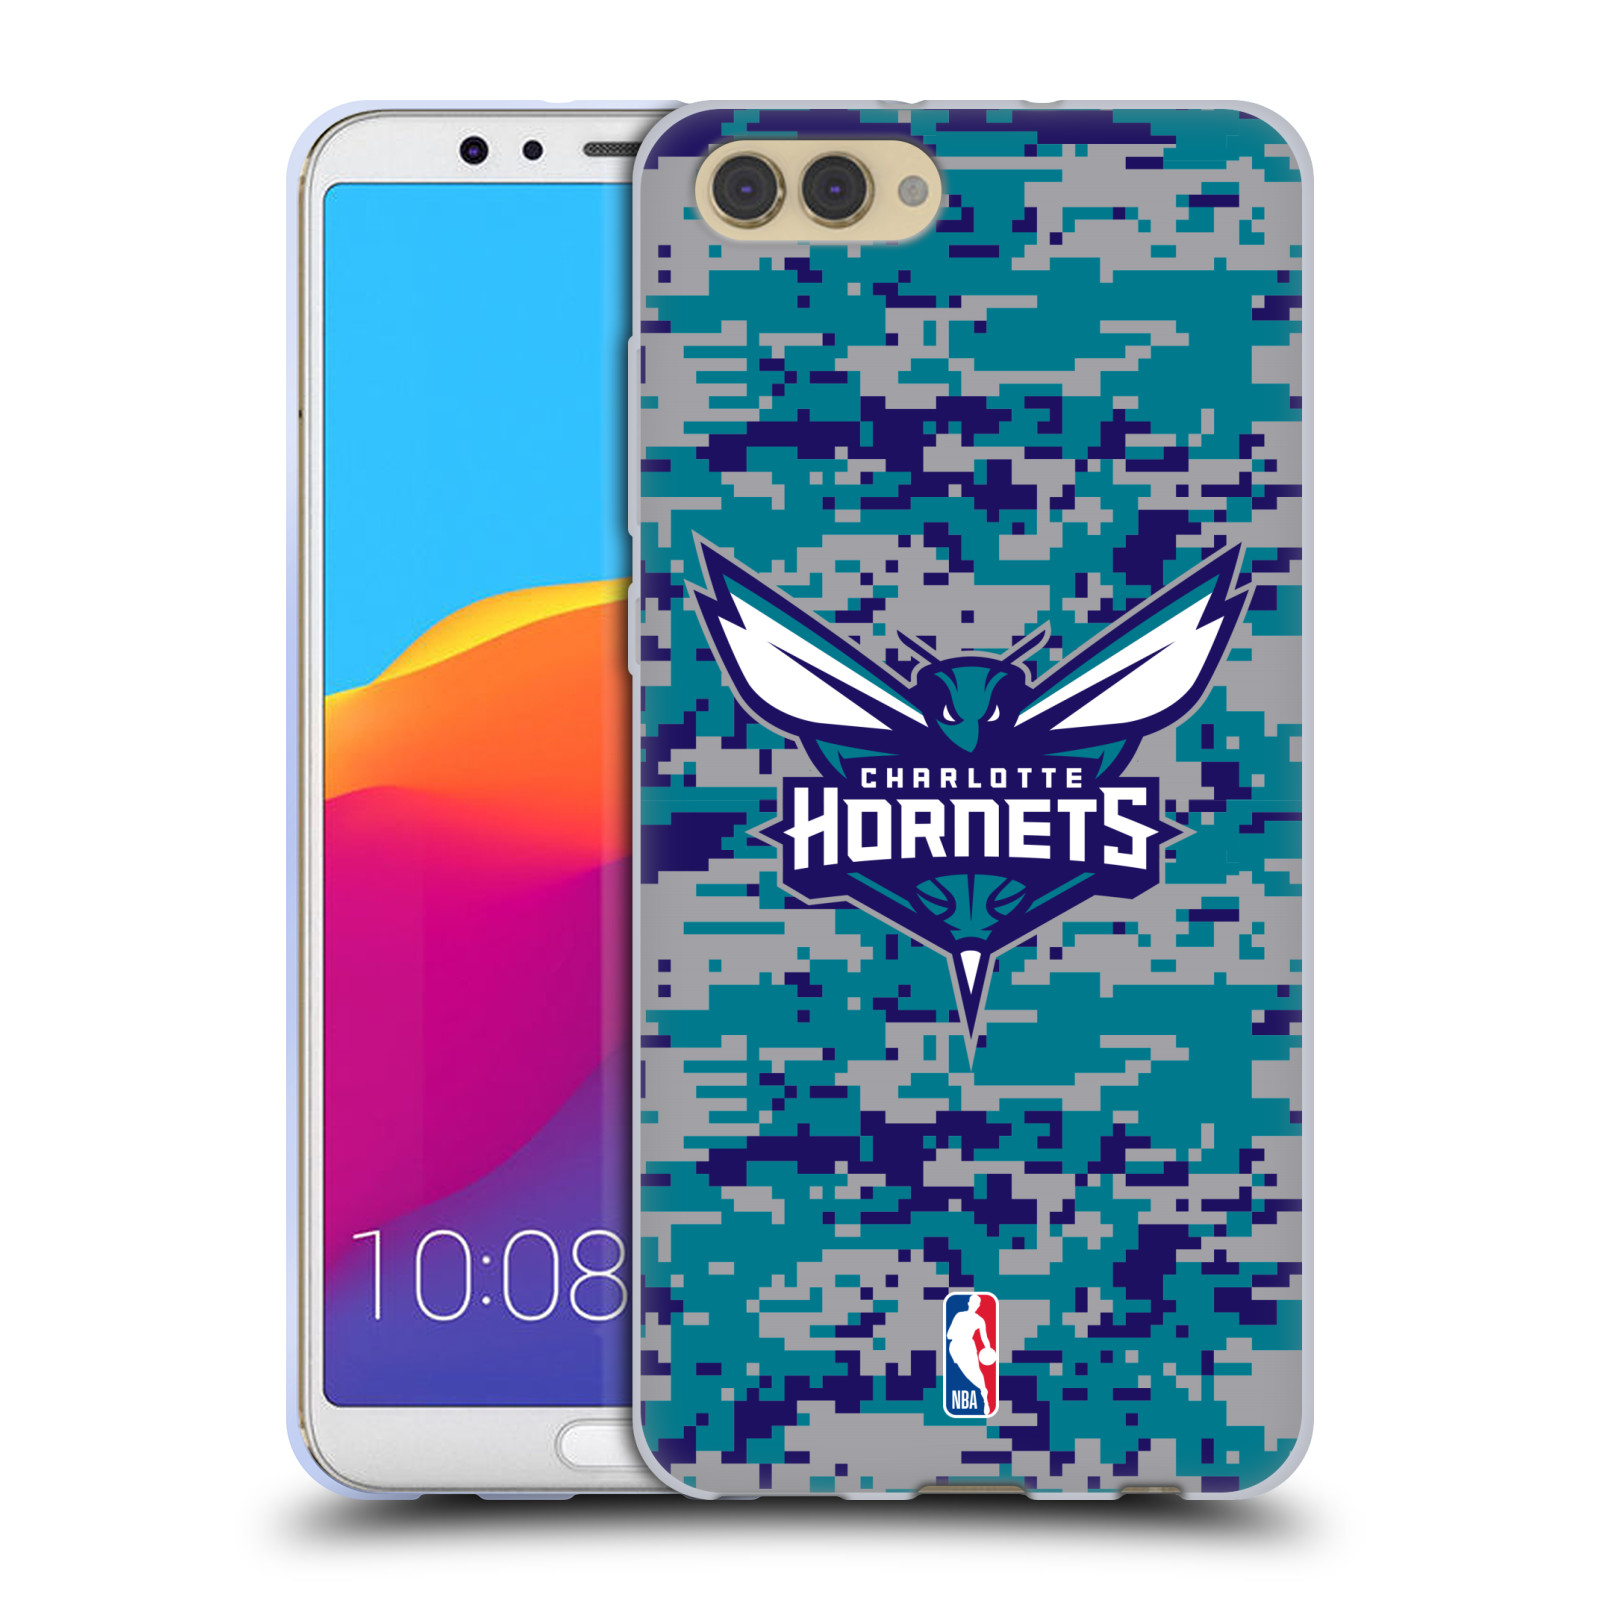 HEAD CASE silikonový obal na mobil Huawei HONOR VIEW 10 / V10 NBA Basketbalový klub Charlotte Hornets kamuflaž znak